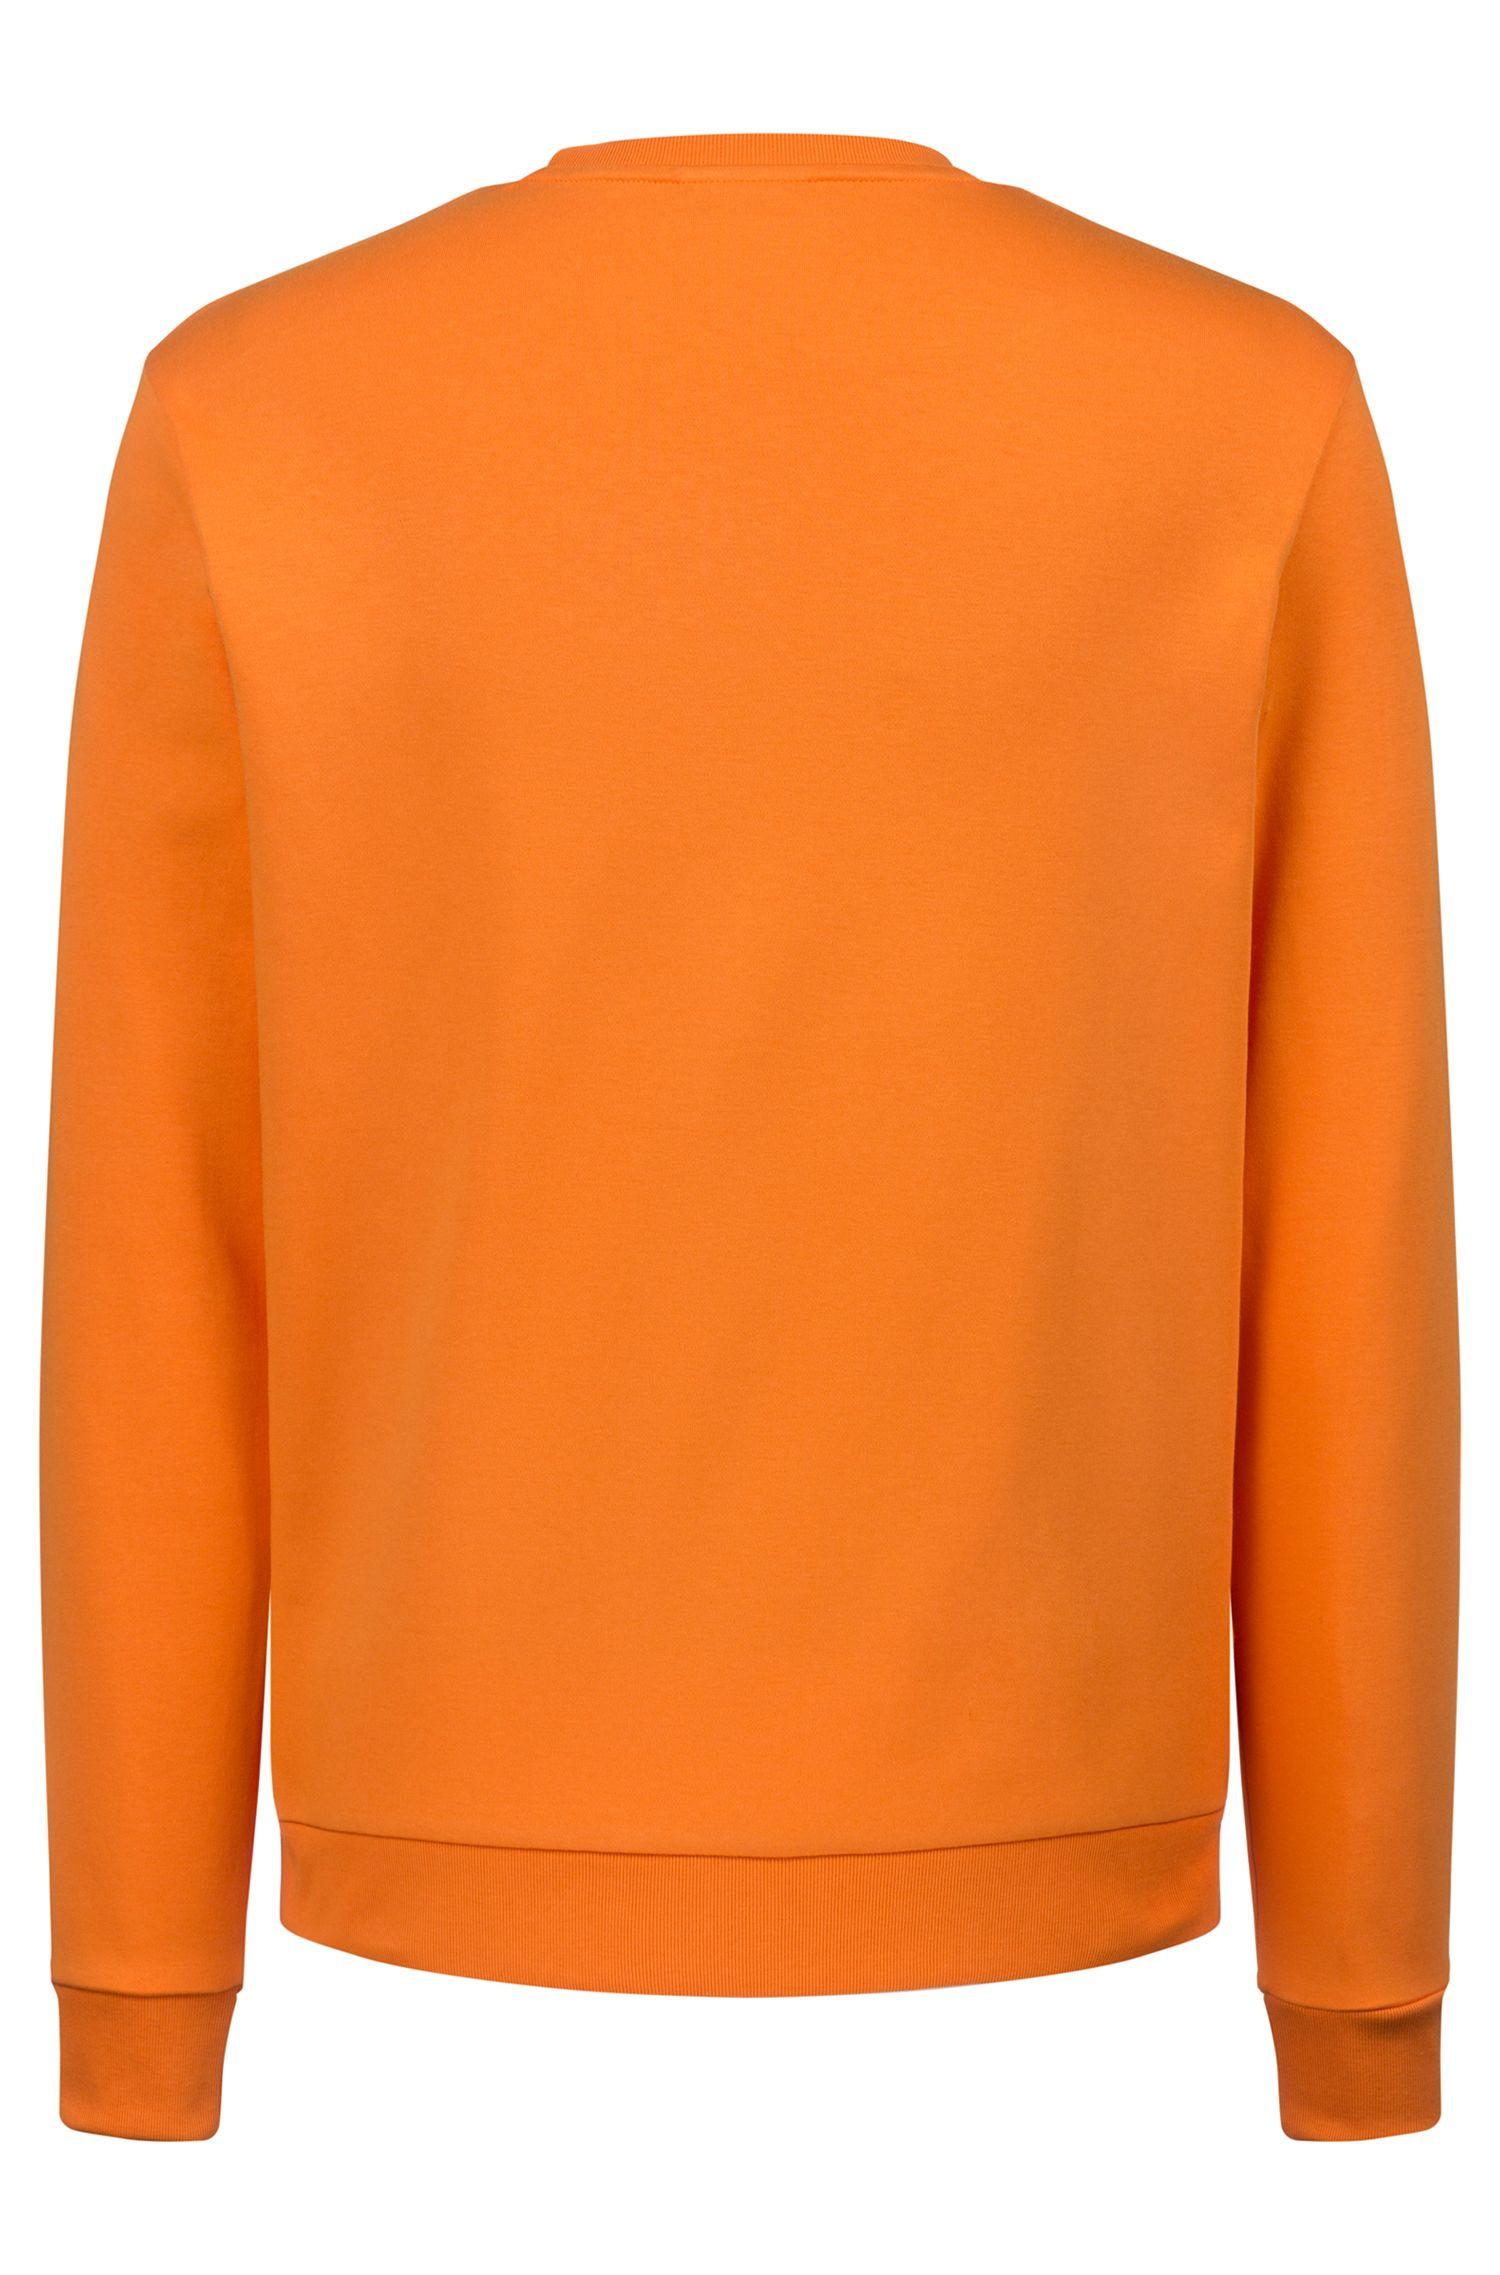 Felpa regular fit in cotone intrecciato con logo a rovescio stampato, Arancione